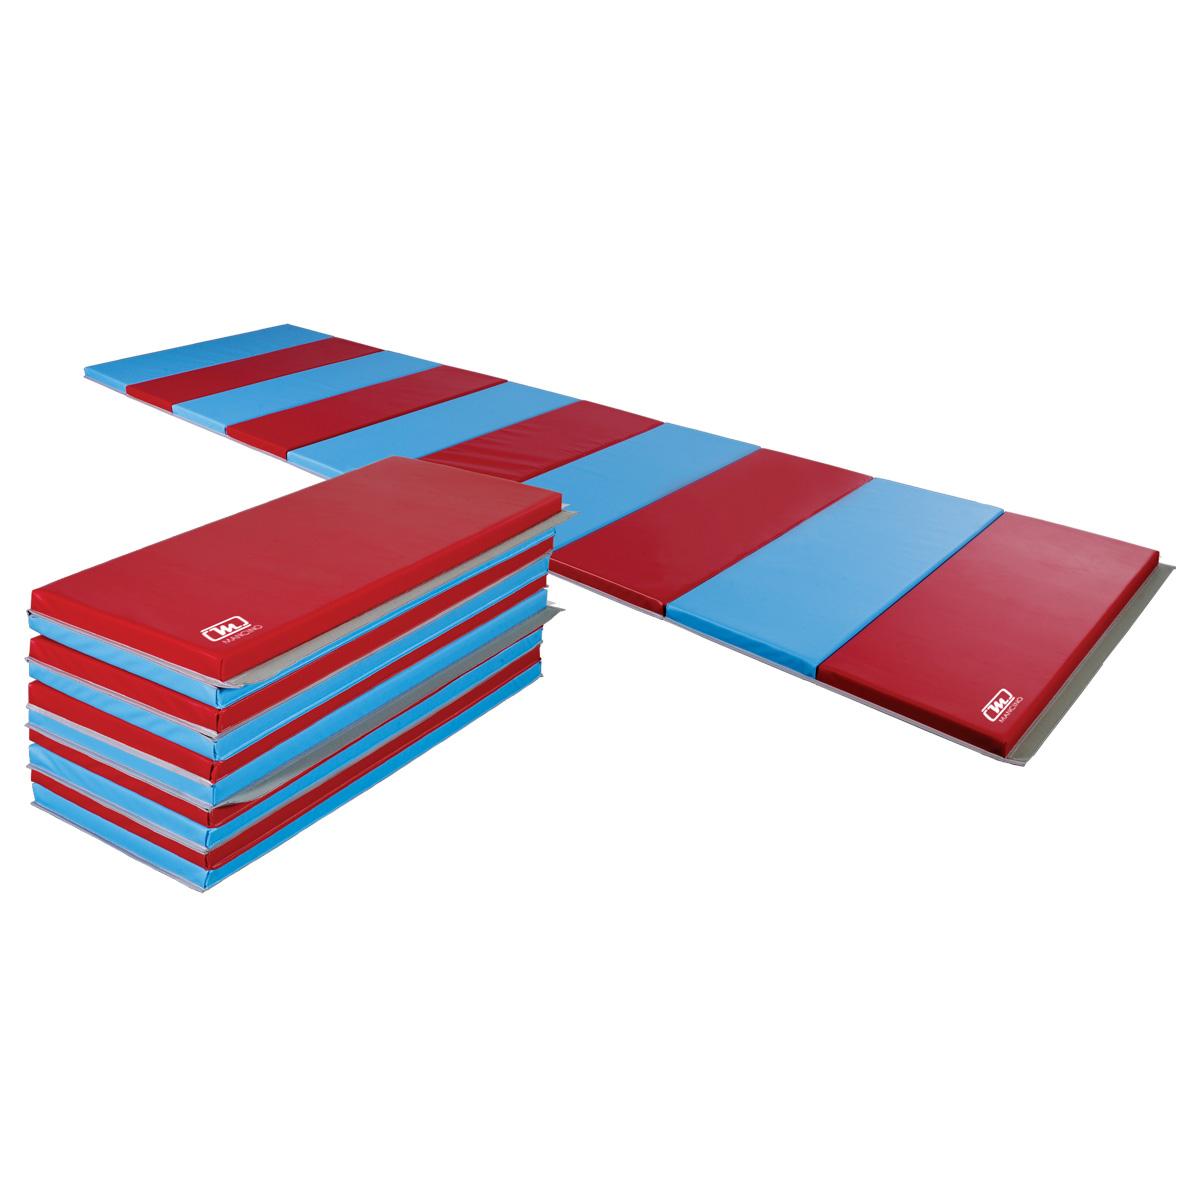 "mancino mats - red and blue 2-3/8"" Educator combo-foam folding panel mat"